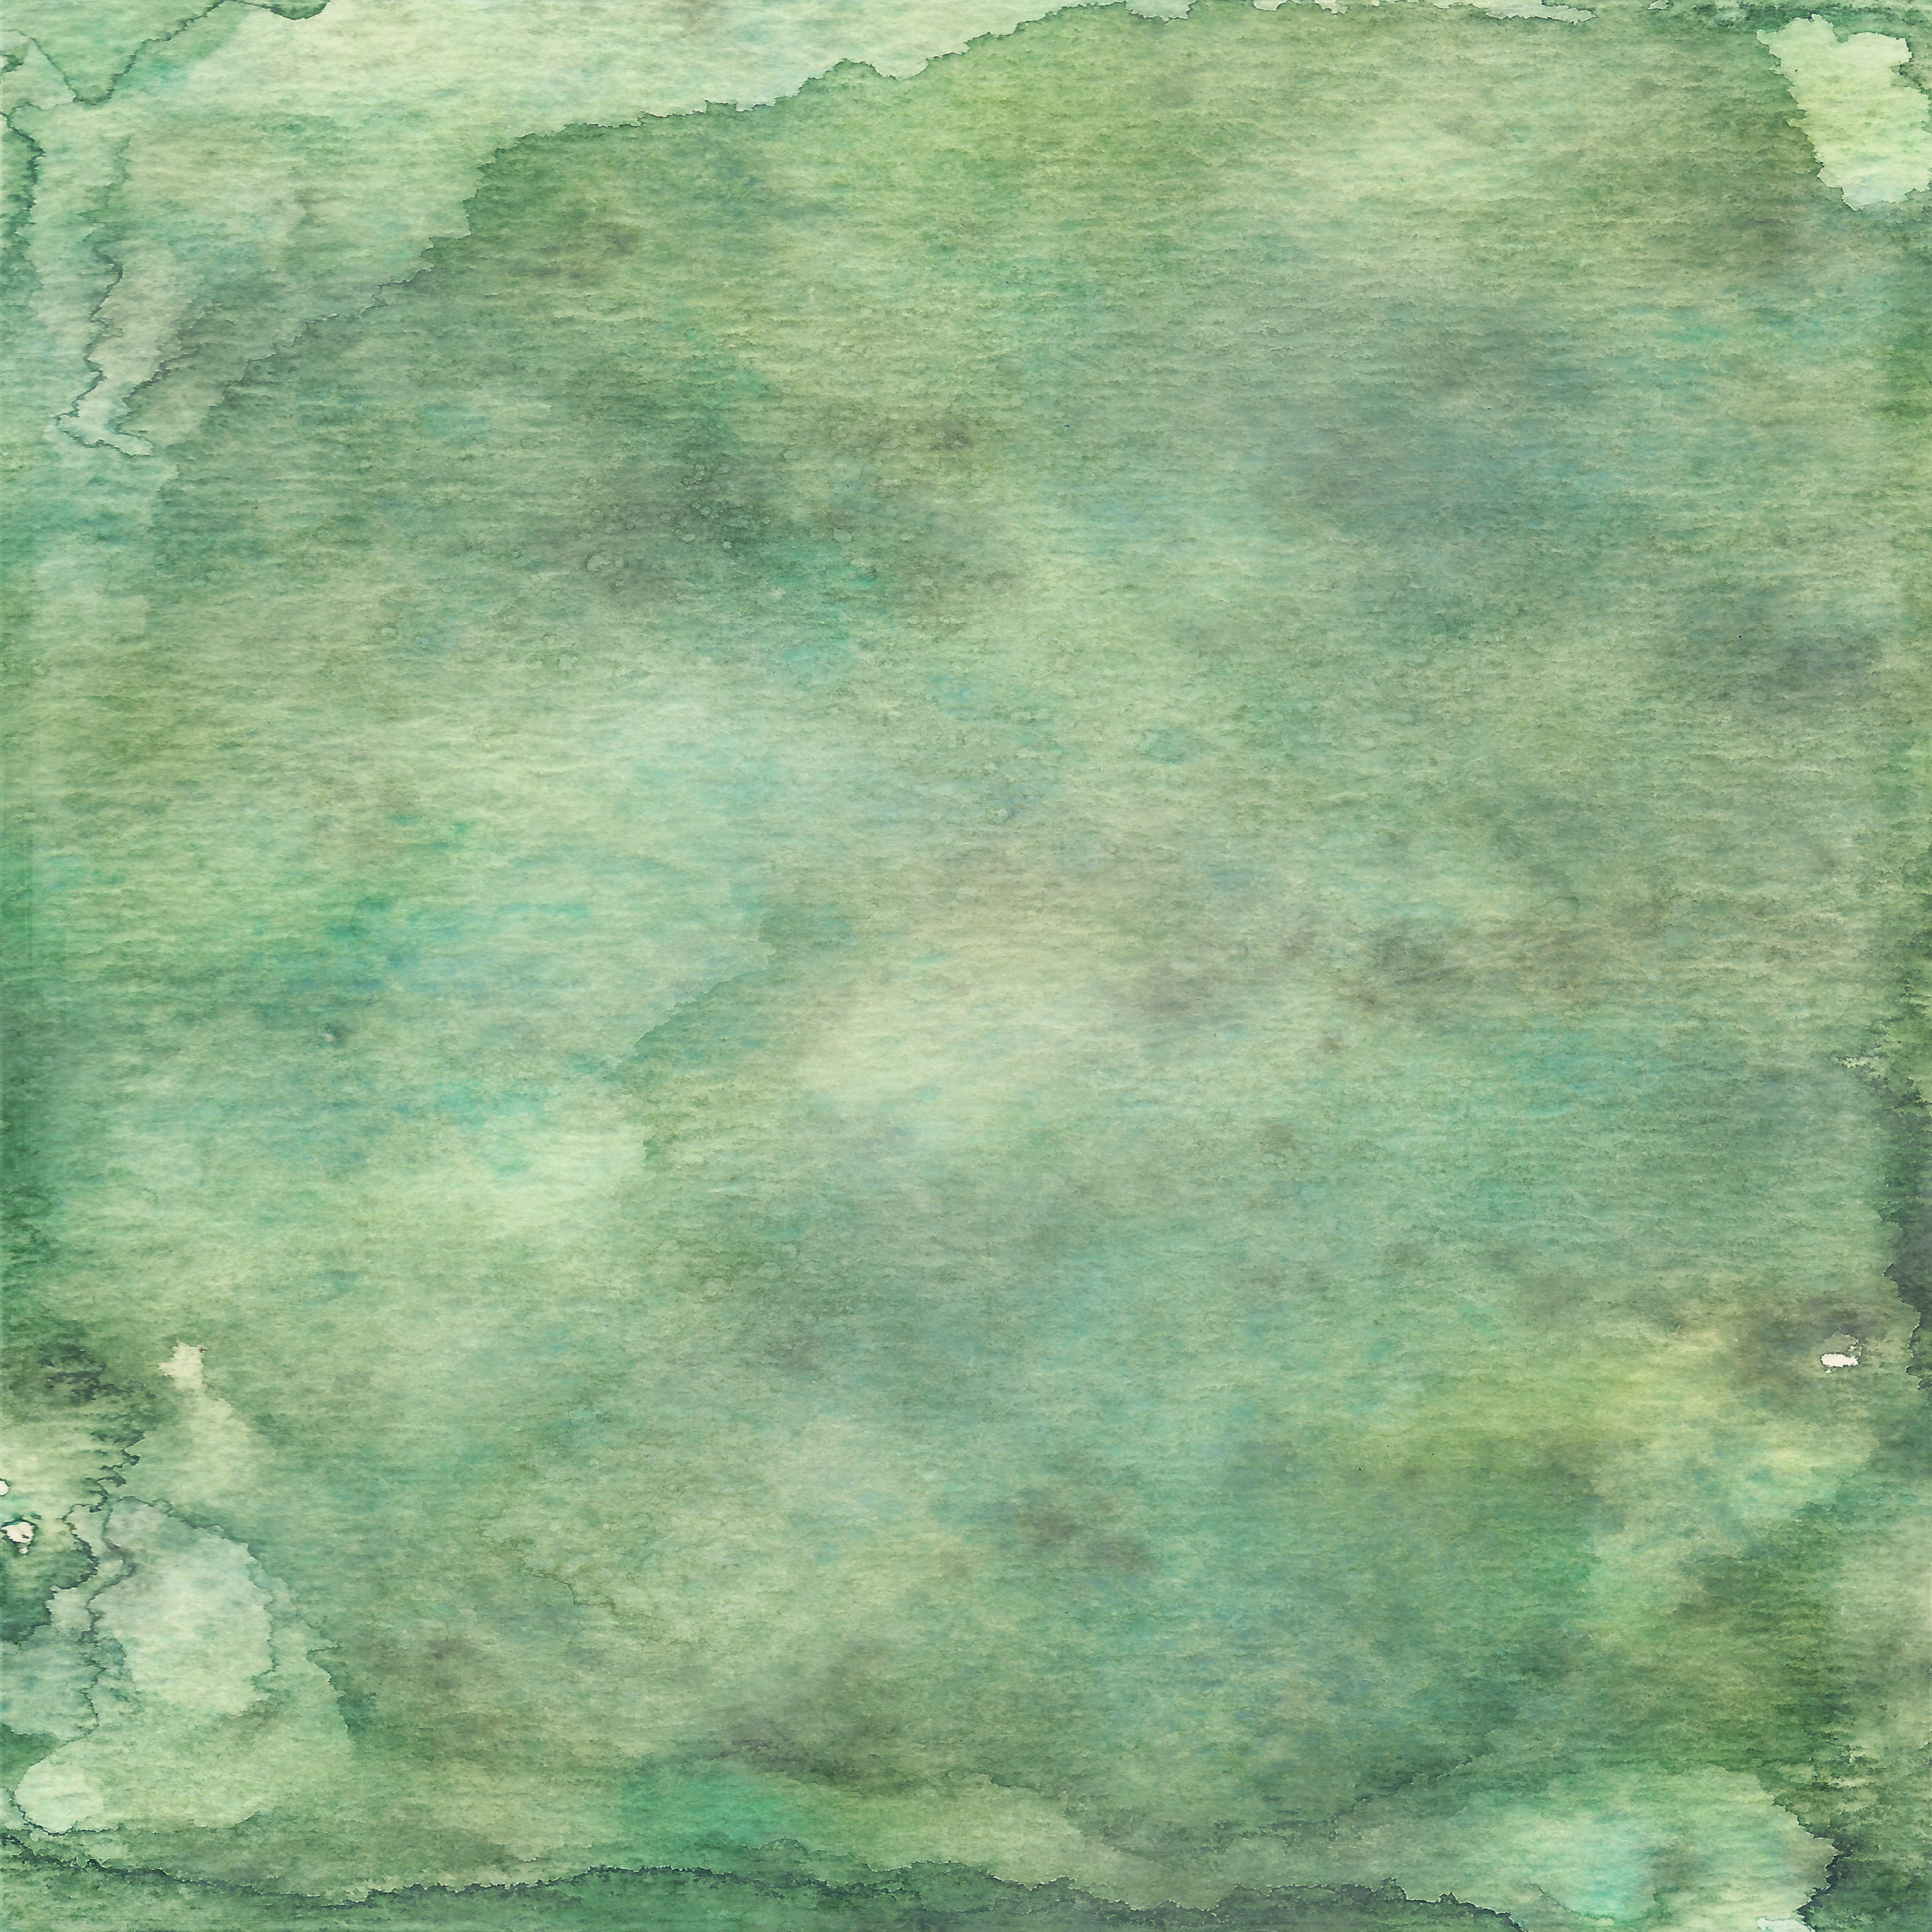 Paint fine art texture photo